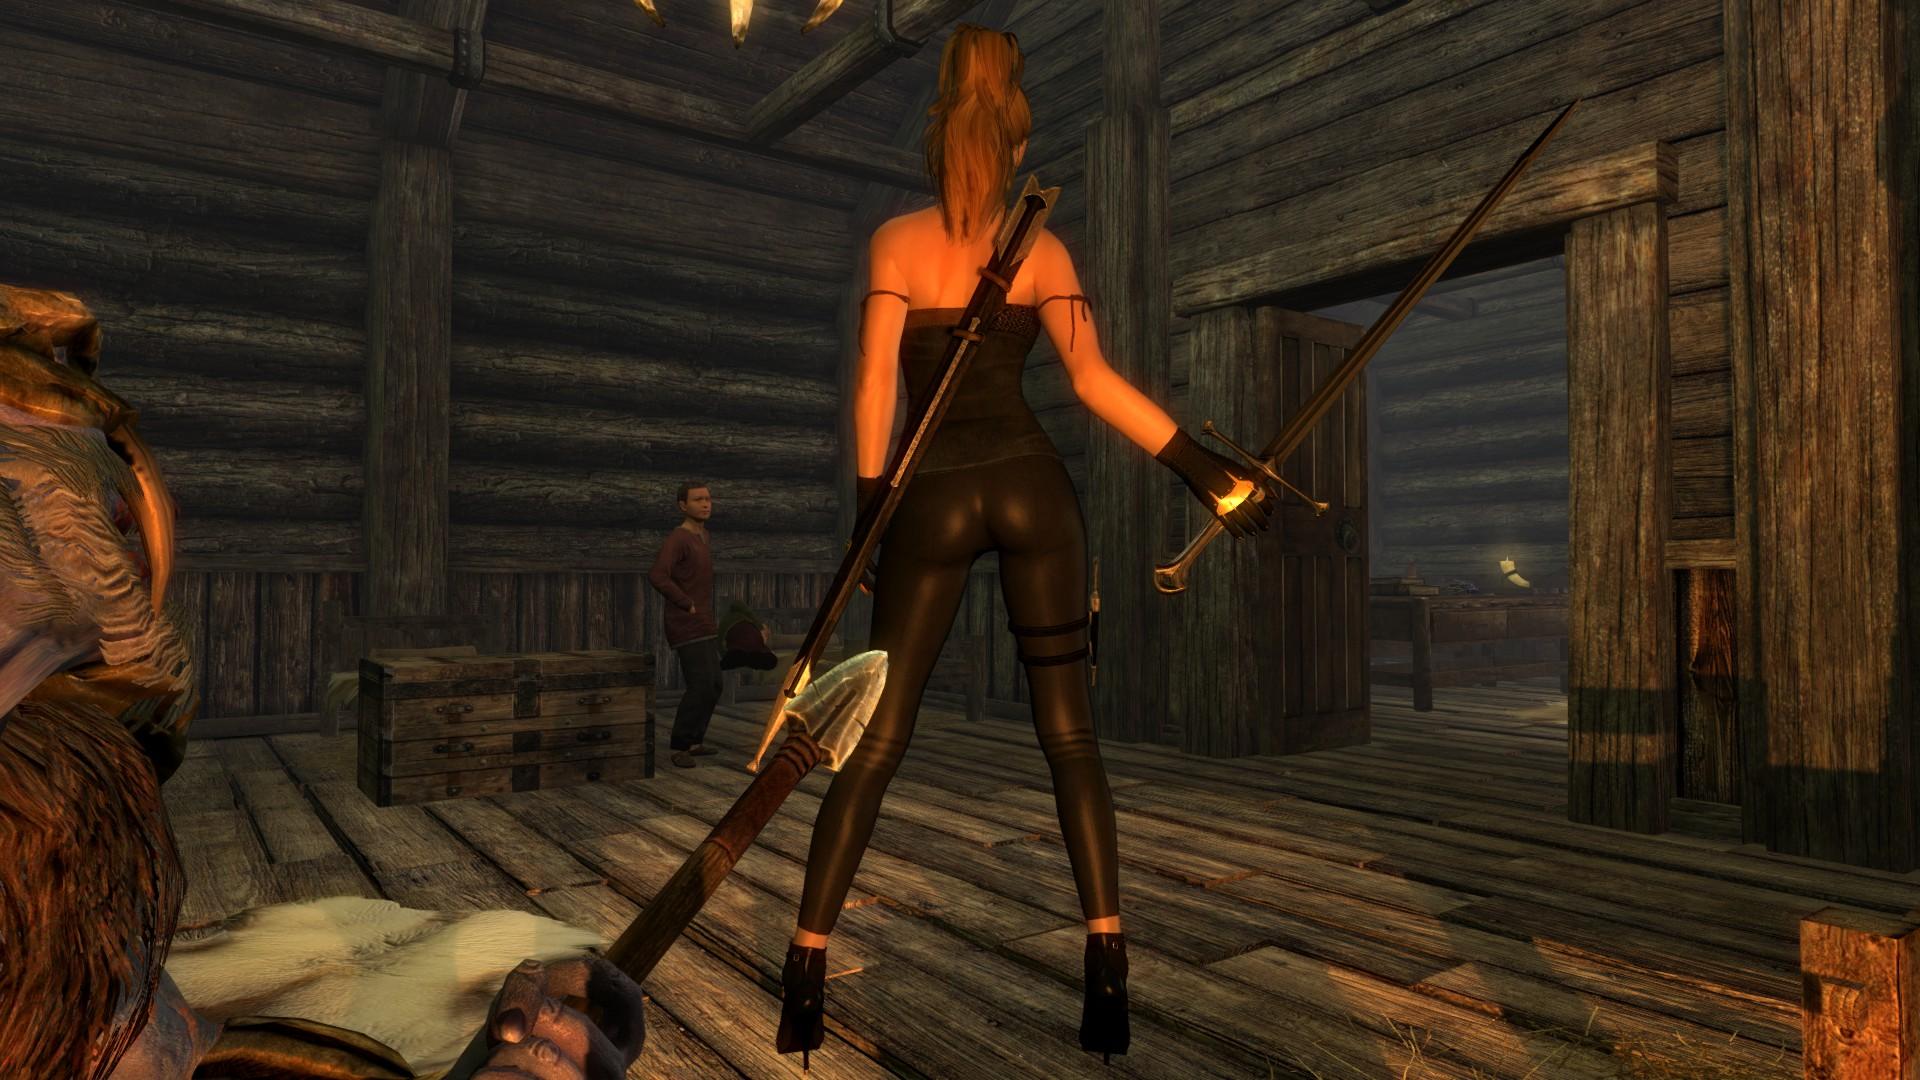 20180728021537_1.jpg - Elder Scrolls 5: Skyrim, the